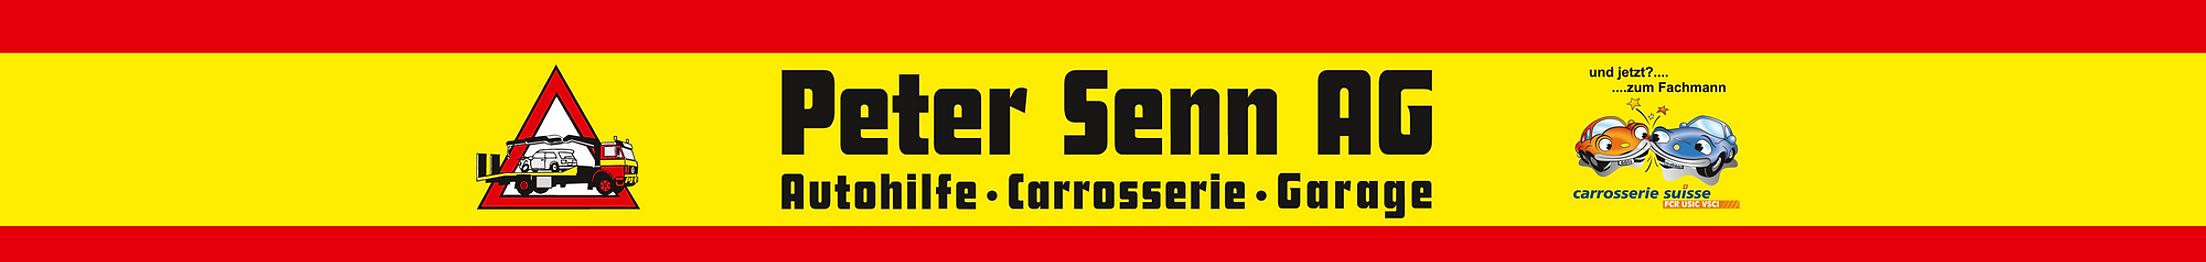 Peter_Senn_AG_web_NEU.png